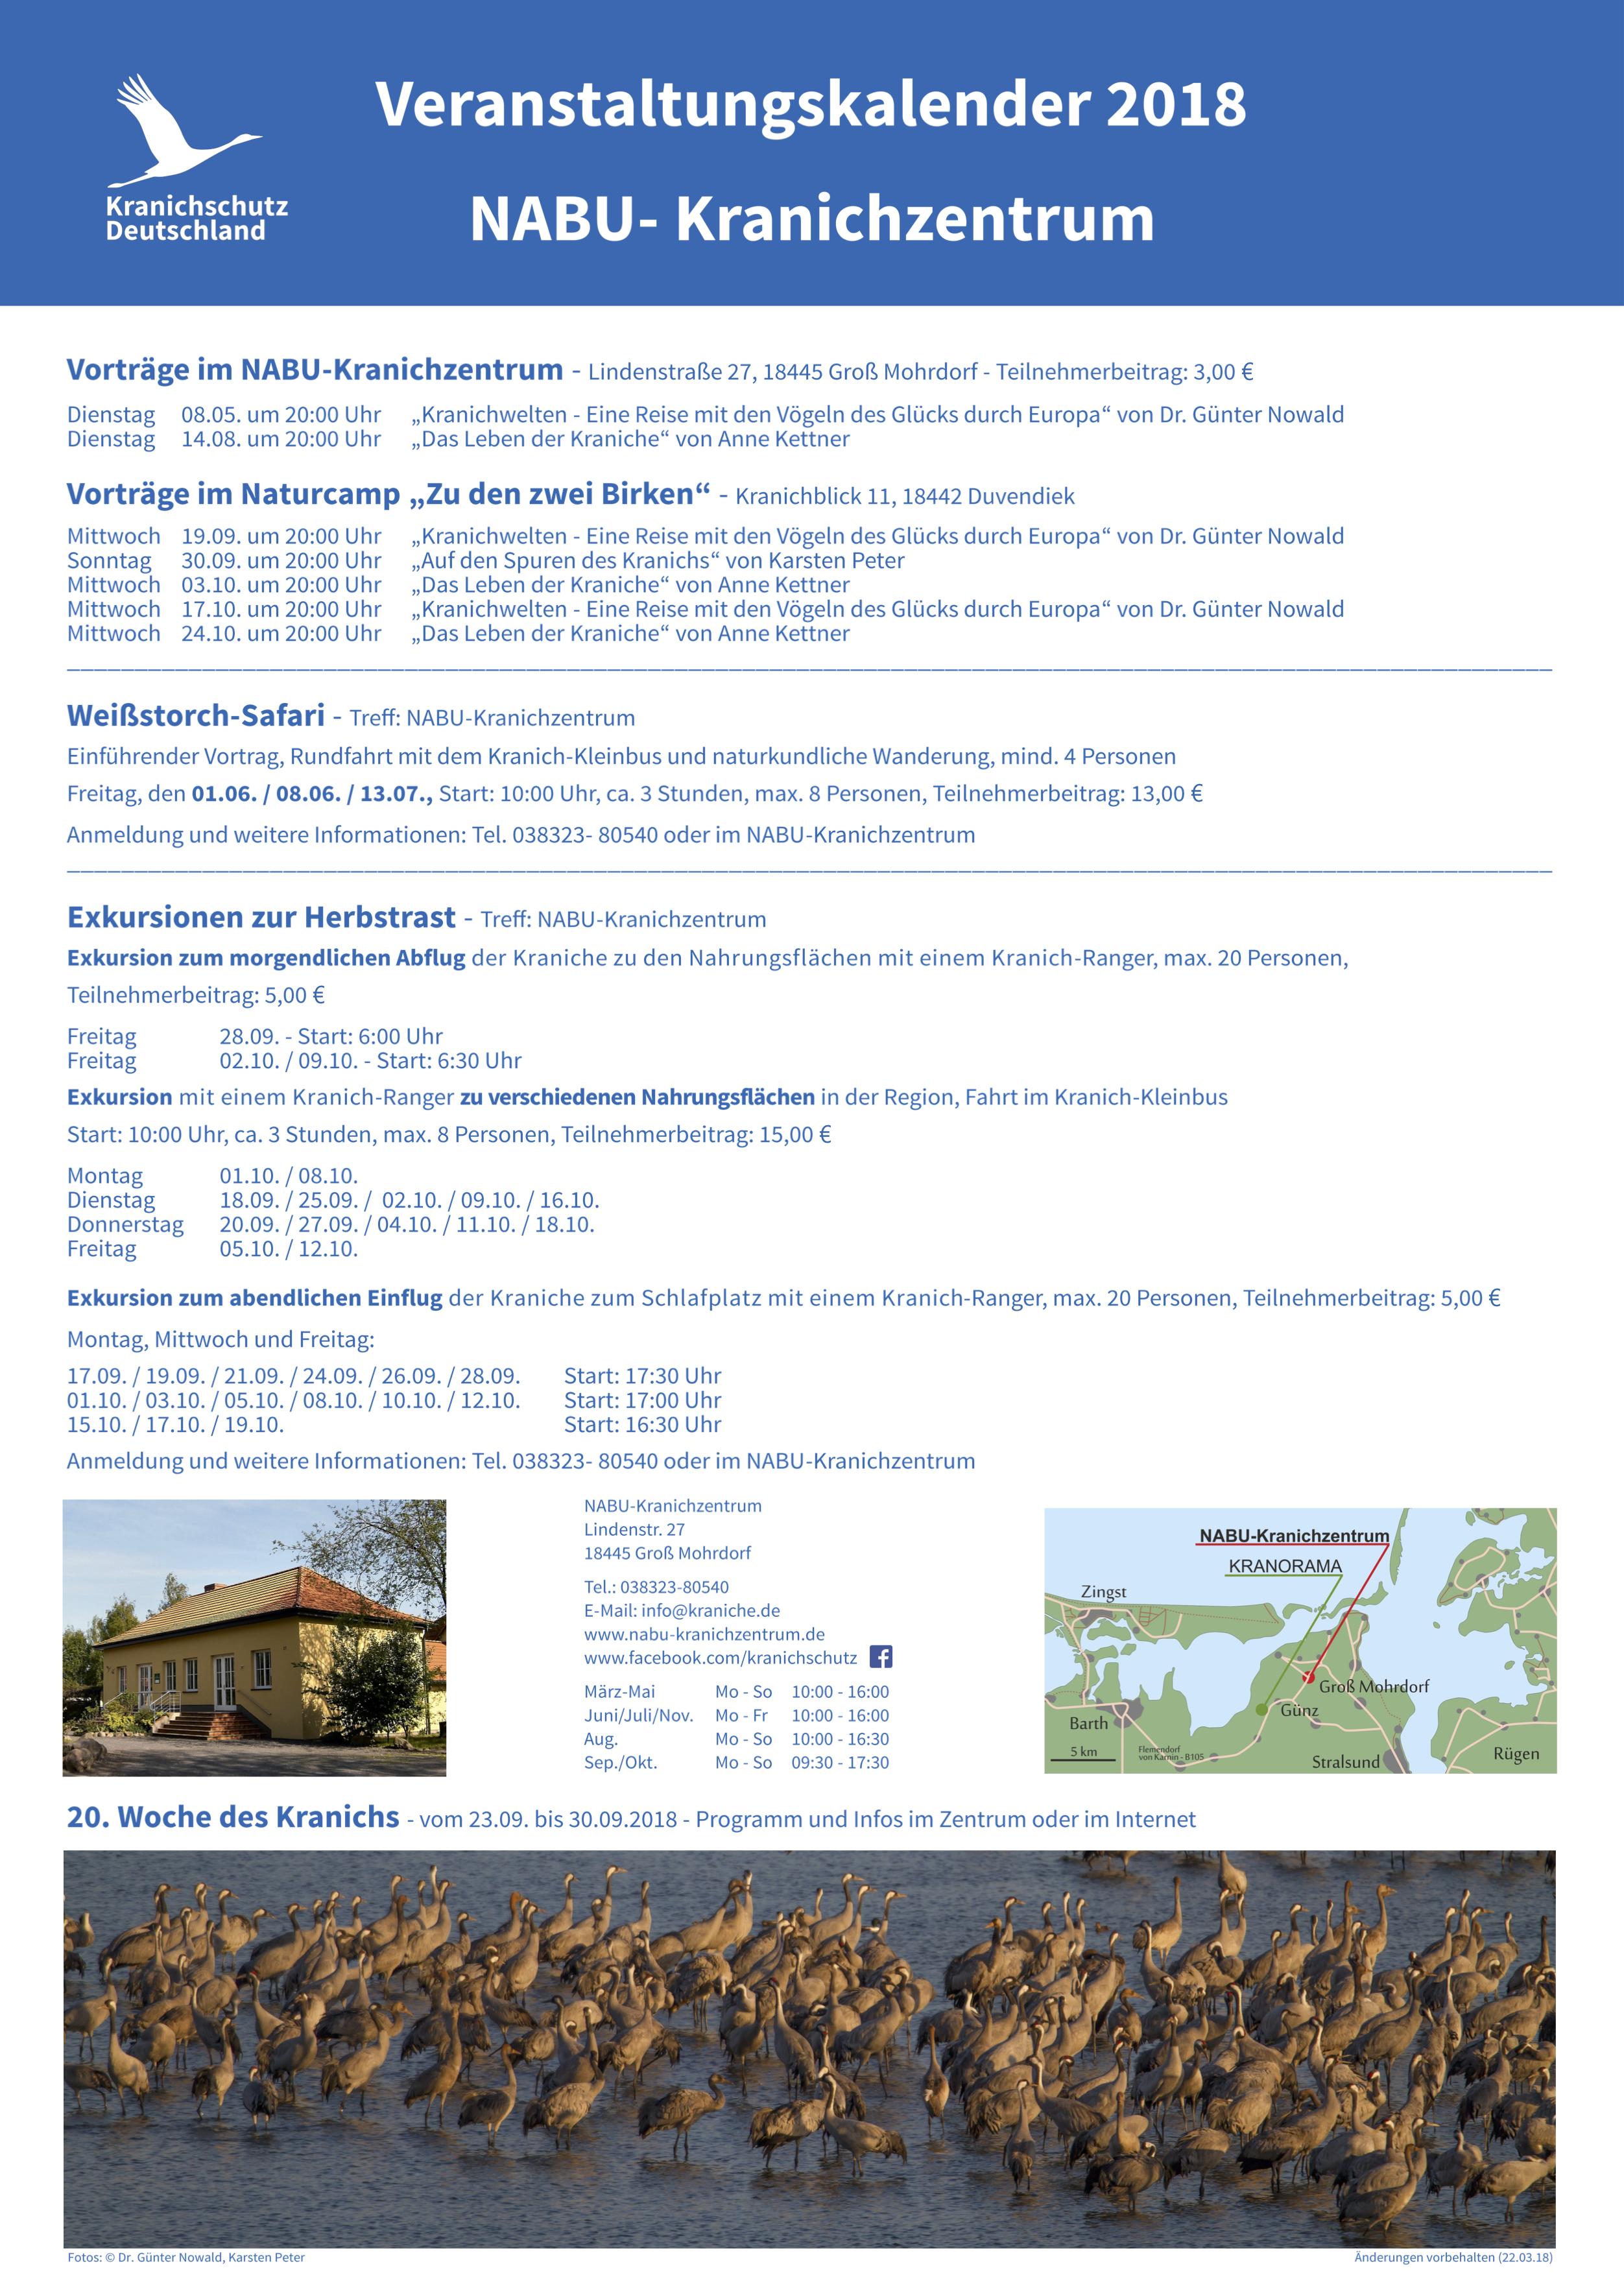 Poster Veranstaltungen Kranichinfo 2018 A2